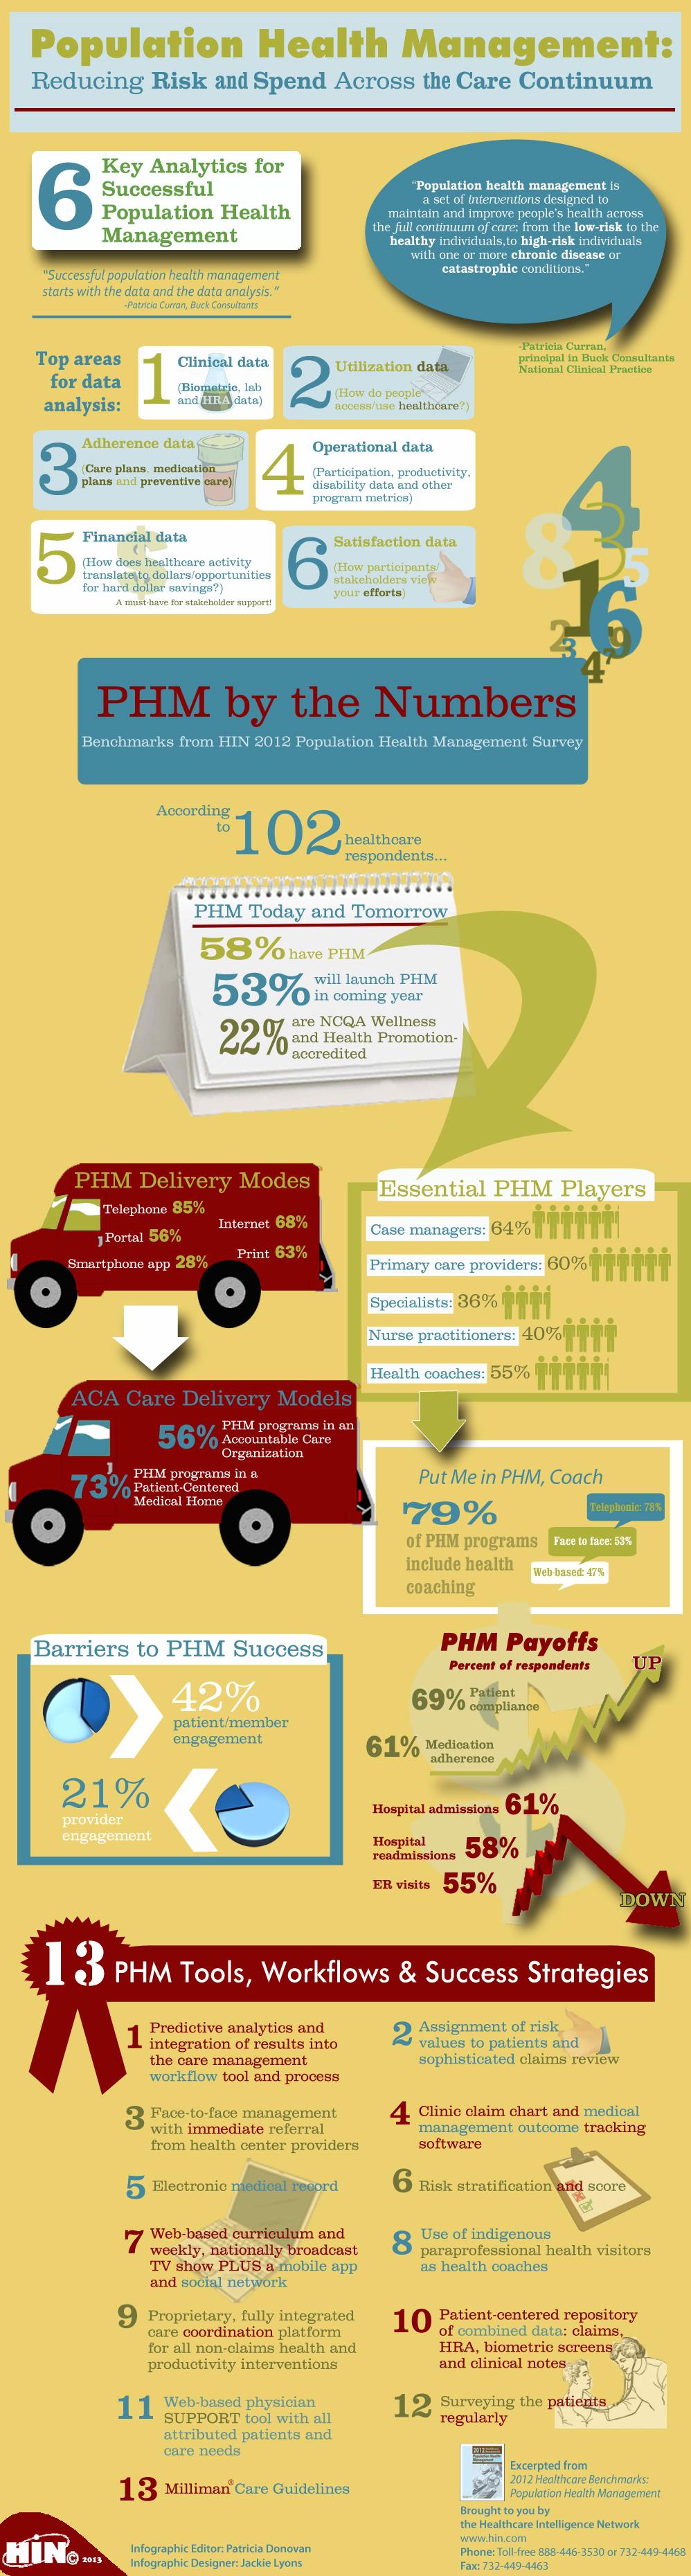 PHM Infographic